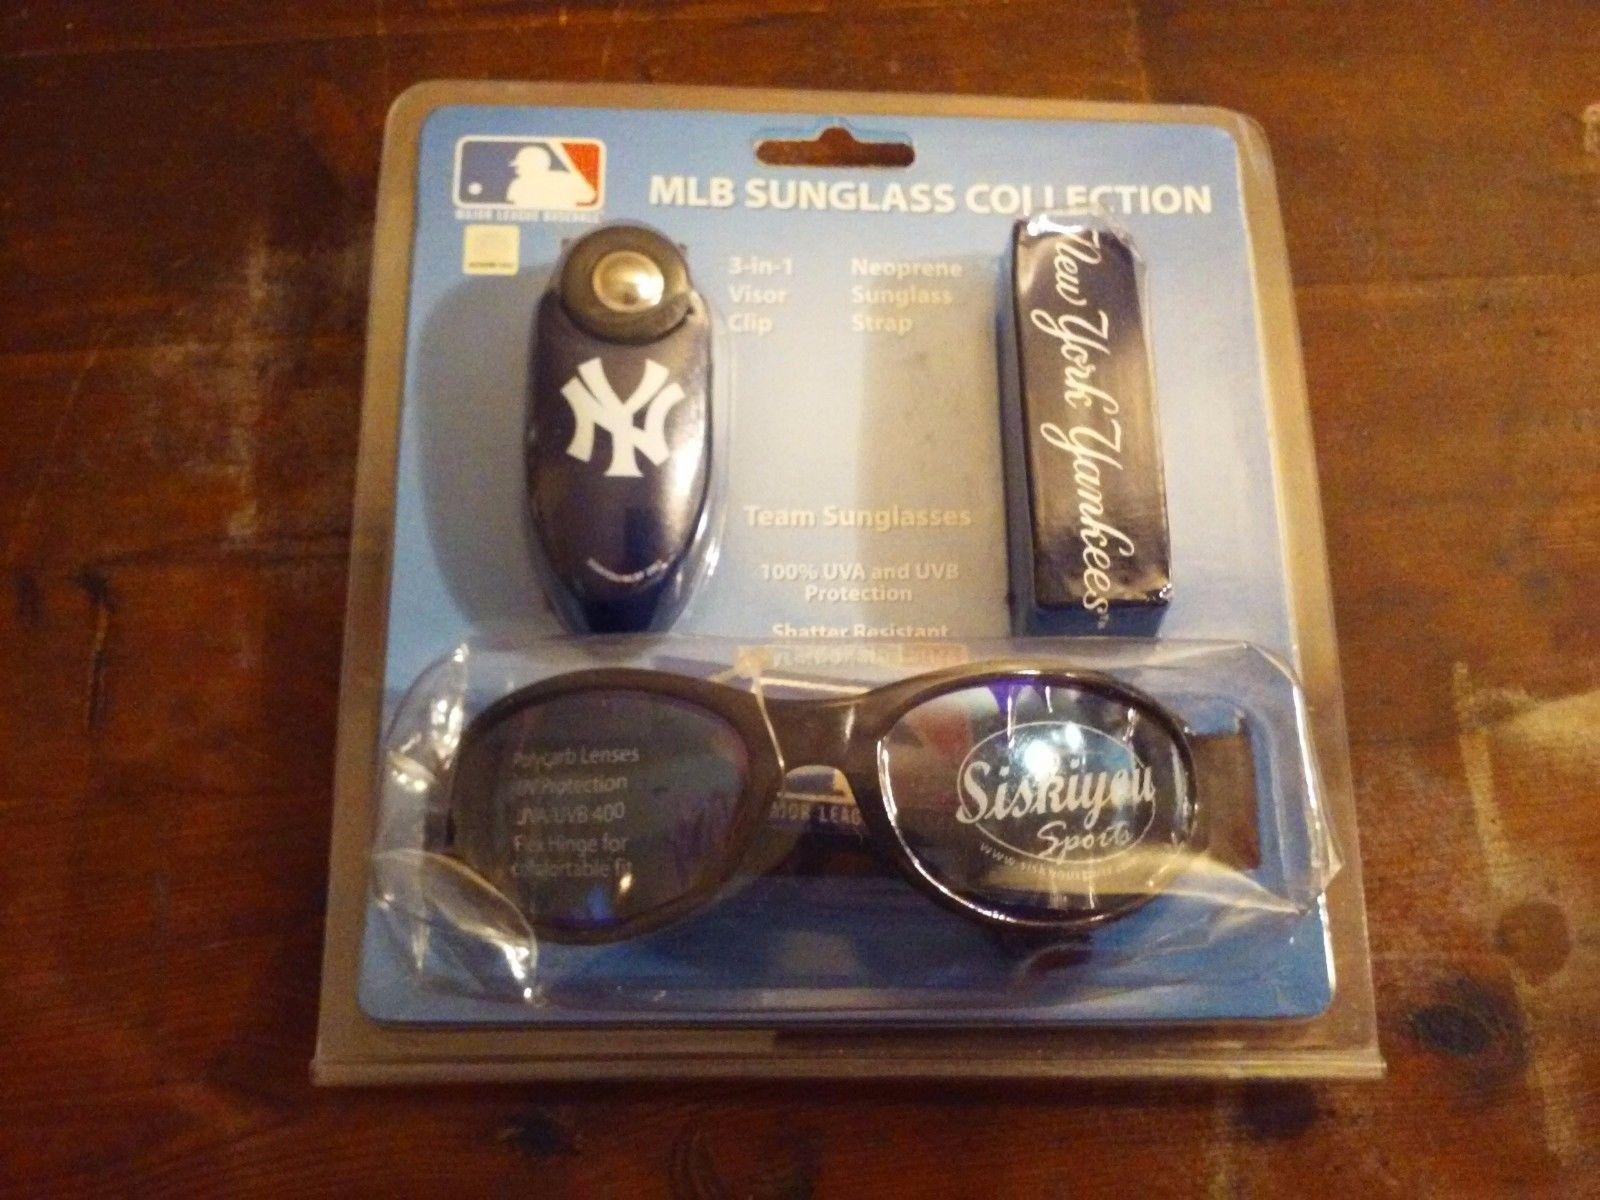 NY Yankees MLB Sunglass Collection 3 in 1 Visor Clip Neoprene Sunglass Strap